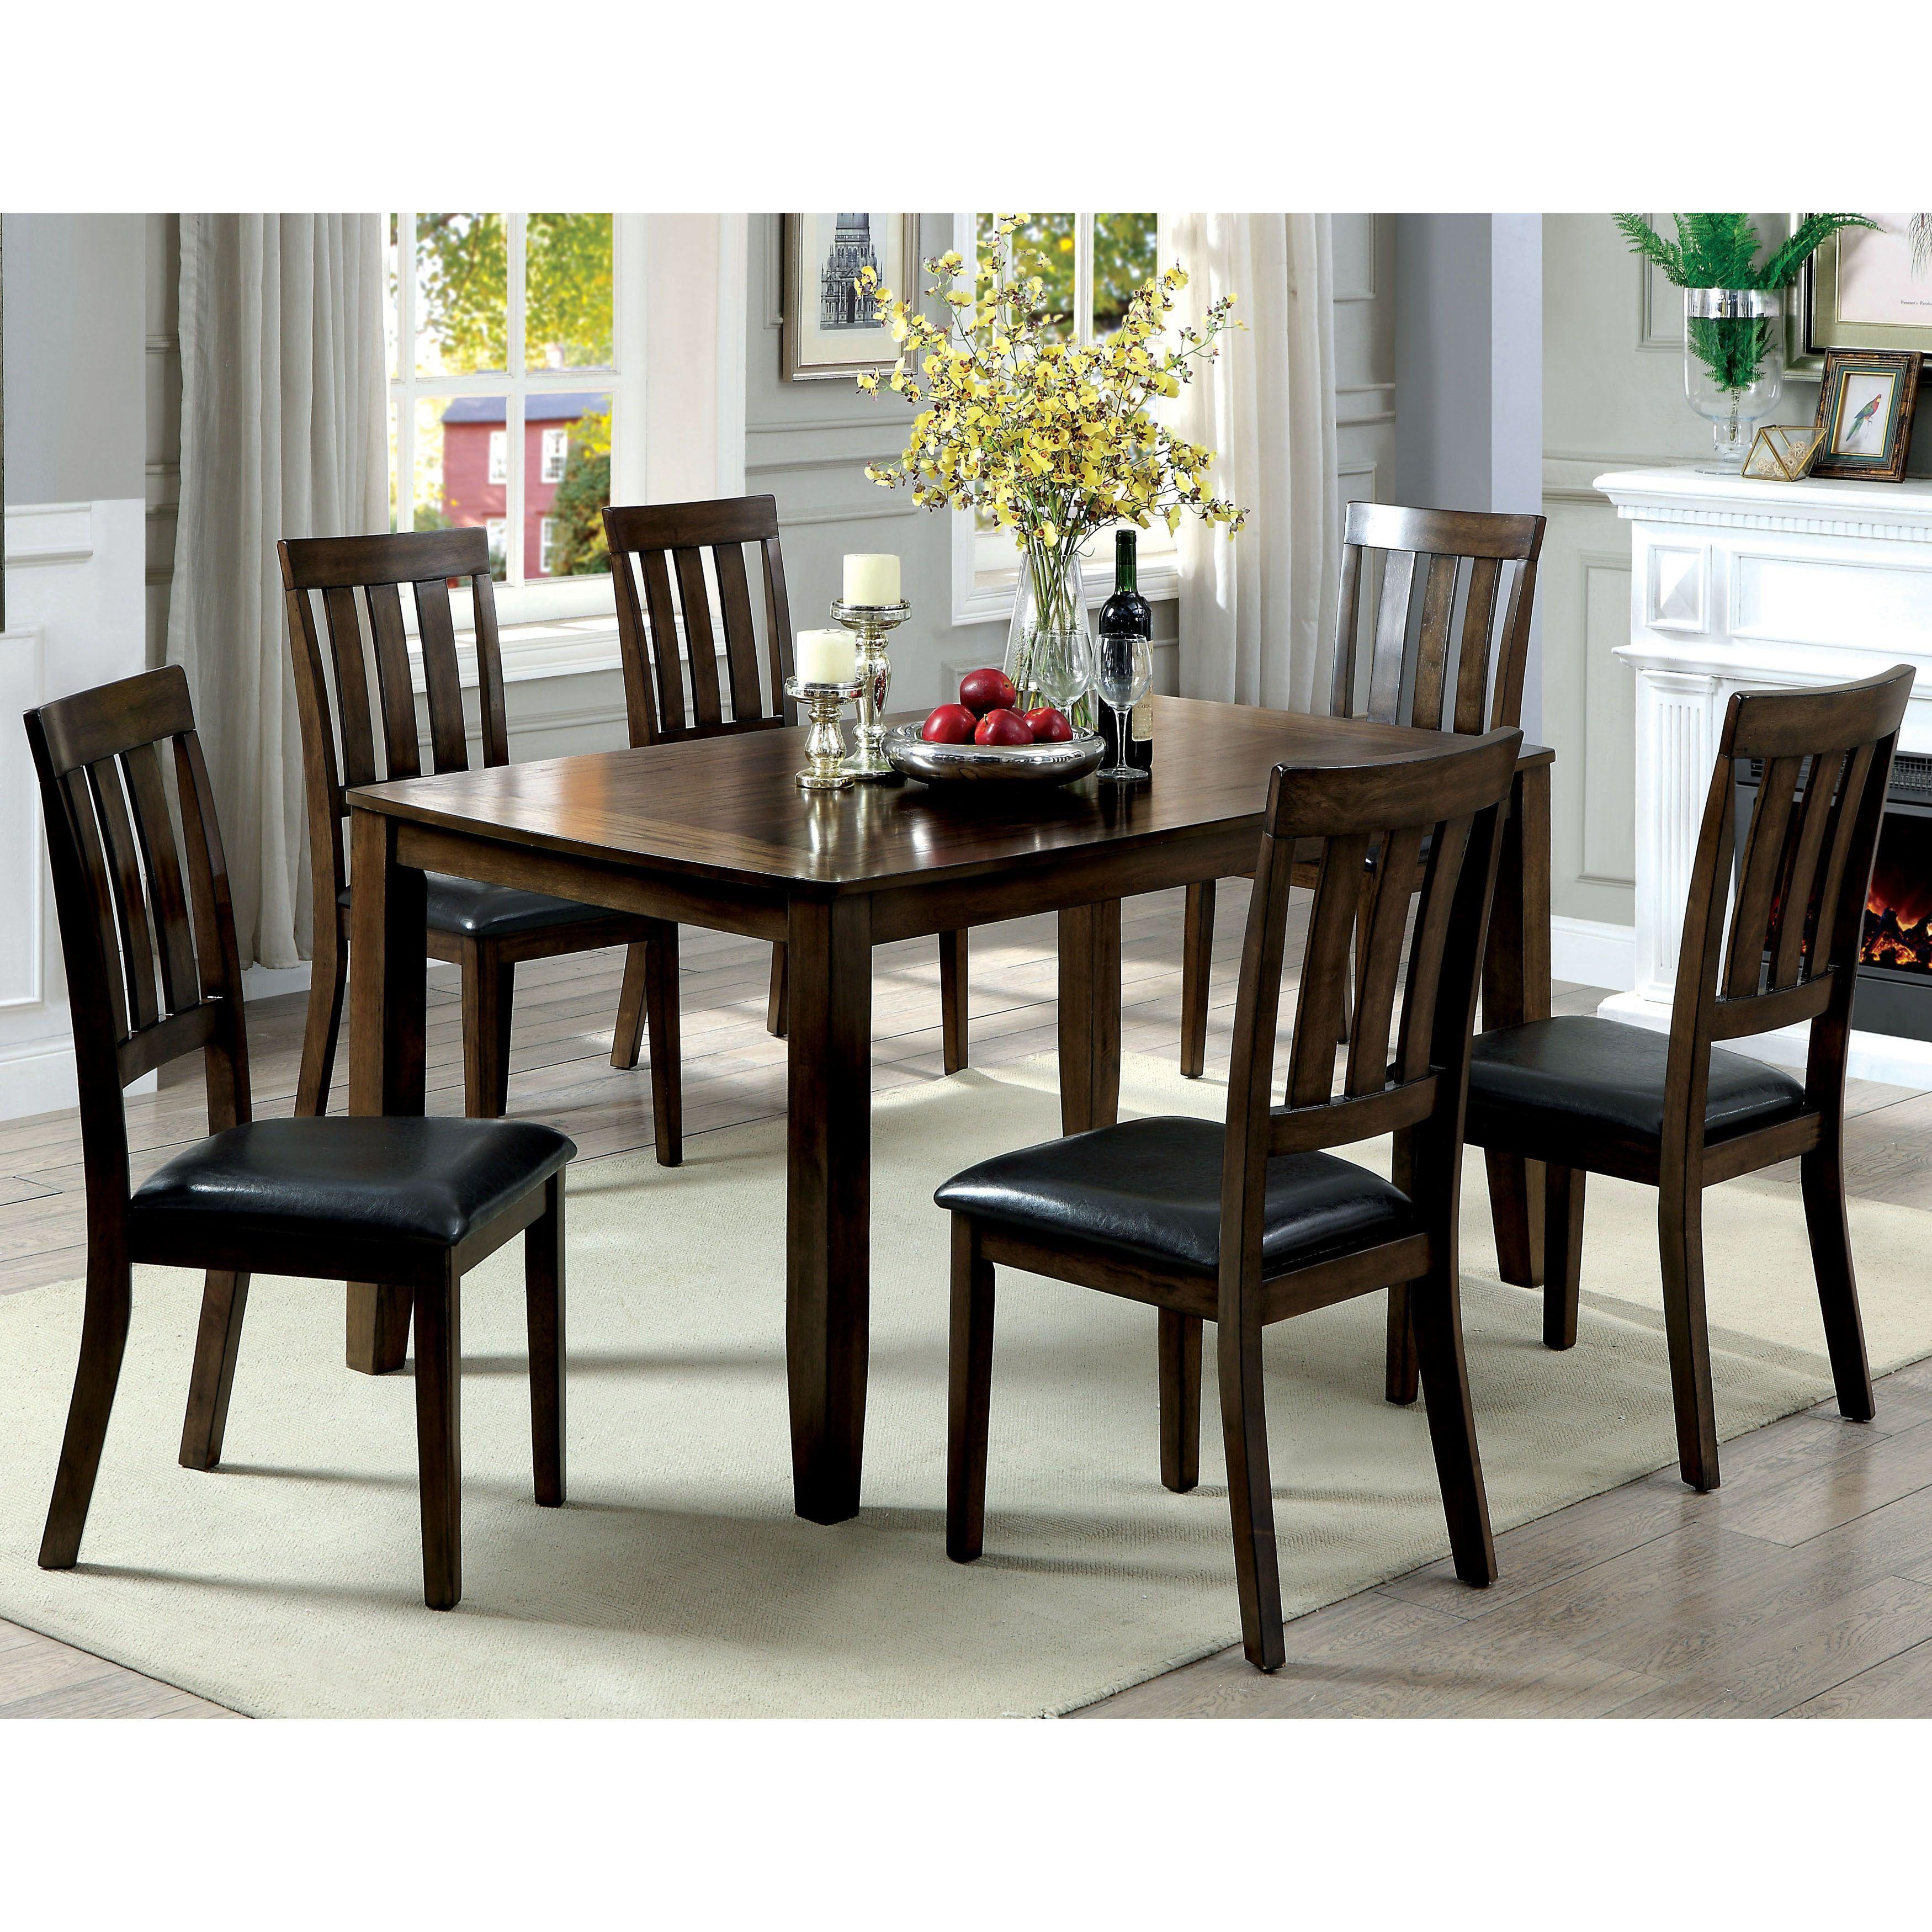 Furniture Of America Merlein Rustic 7 Piece Dark Oak Dining Set (Dark Oak),  Brown, Size 7 Piece Sets